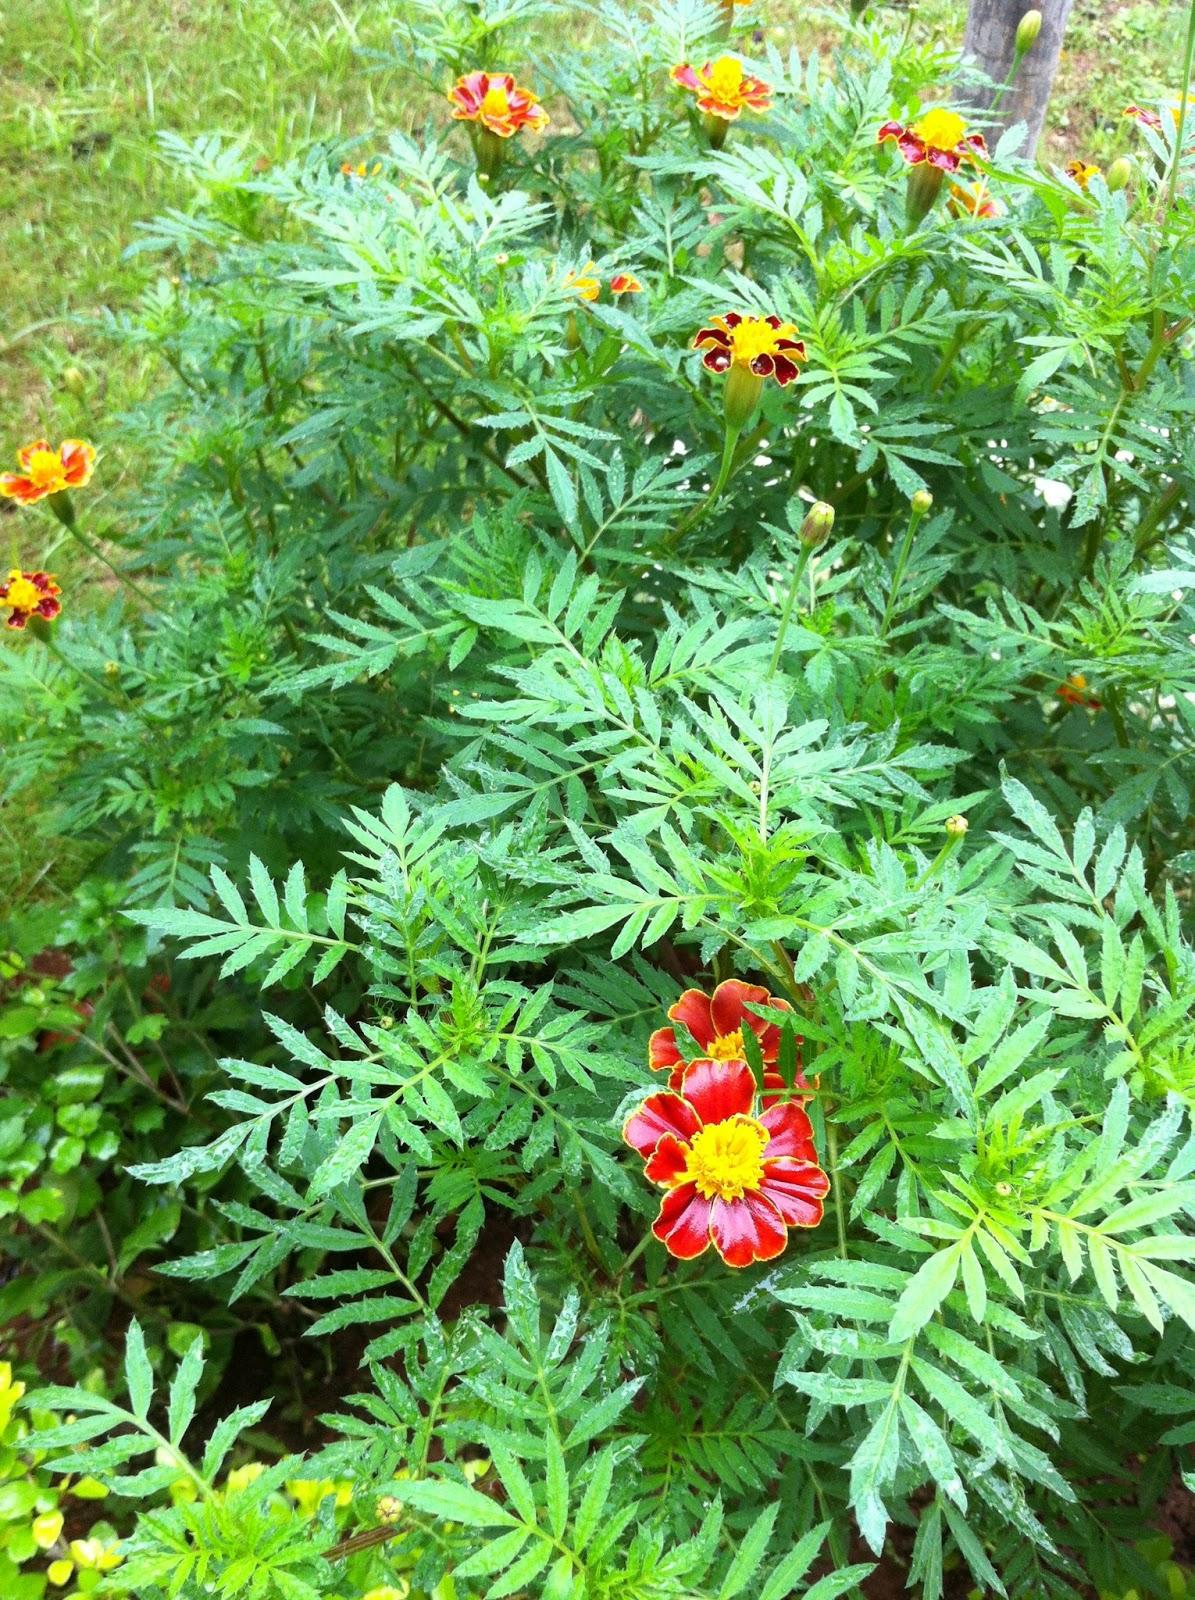 Maha jeevitham morningwalk nature collection 1 home garden common name marigold genda hindi sanarei manipuri jhenduphool marathi gondephool konkani izmirmasajfo